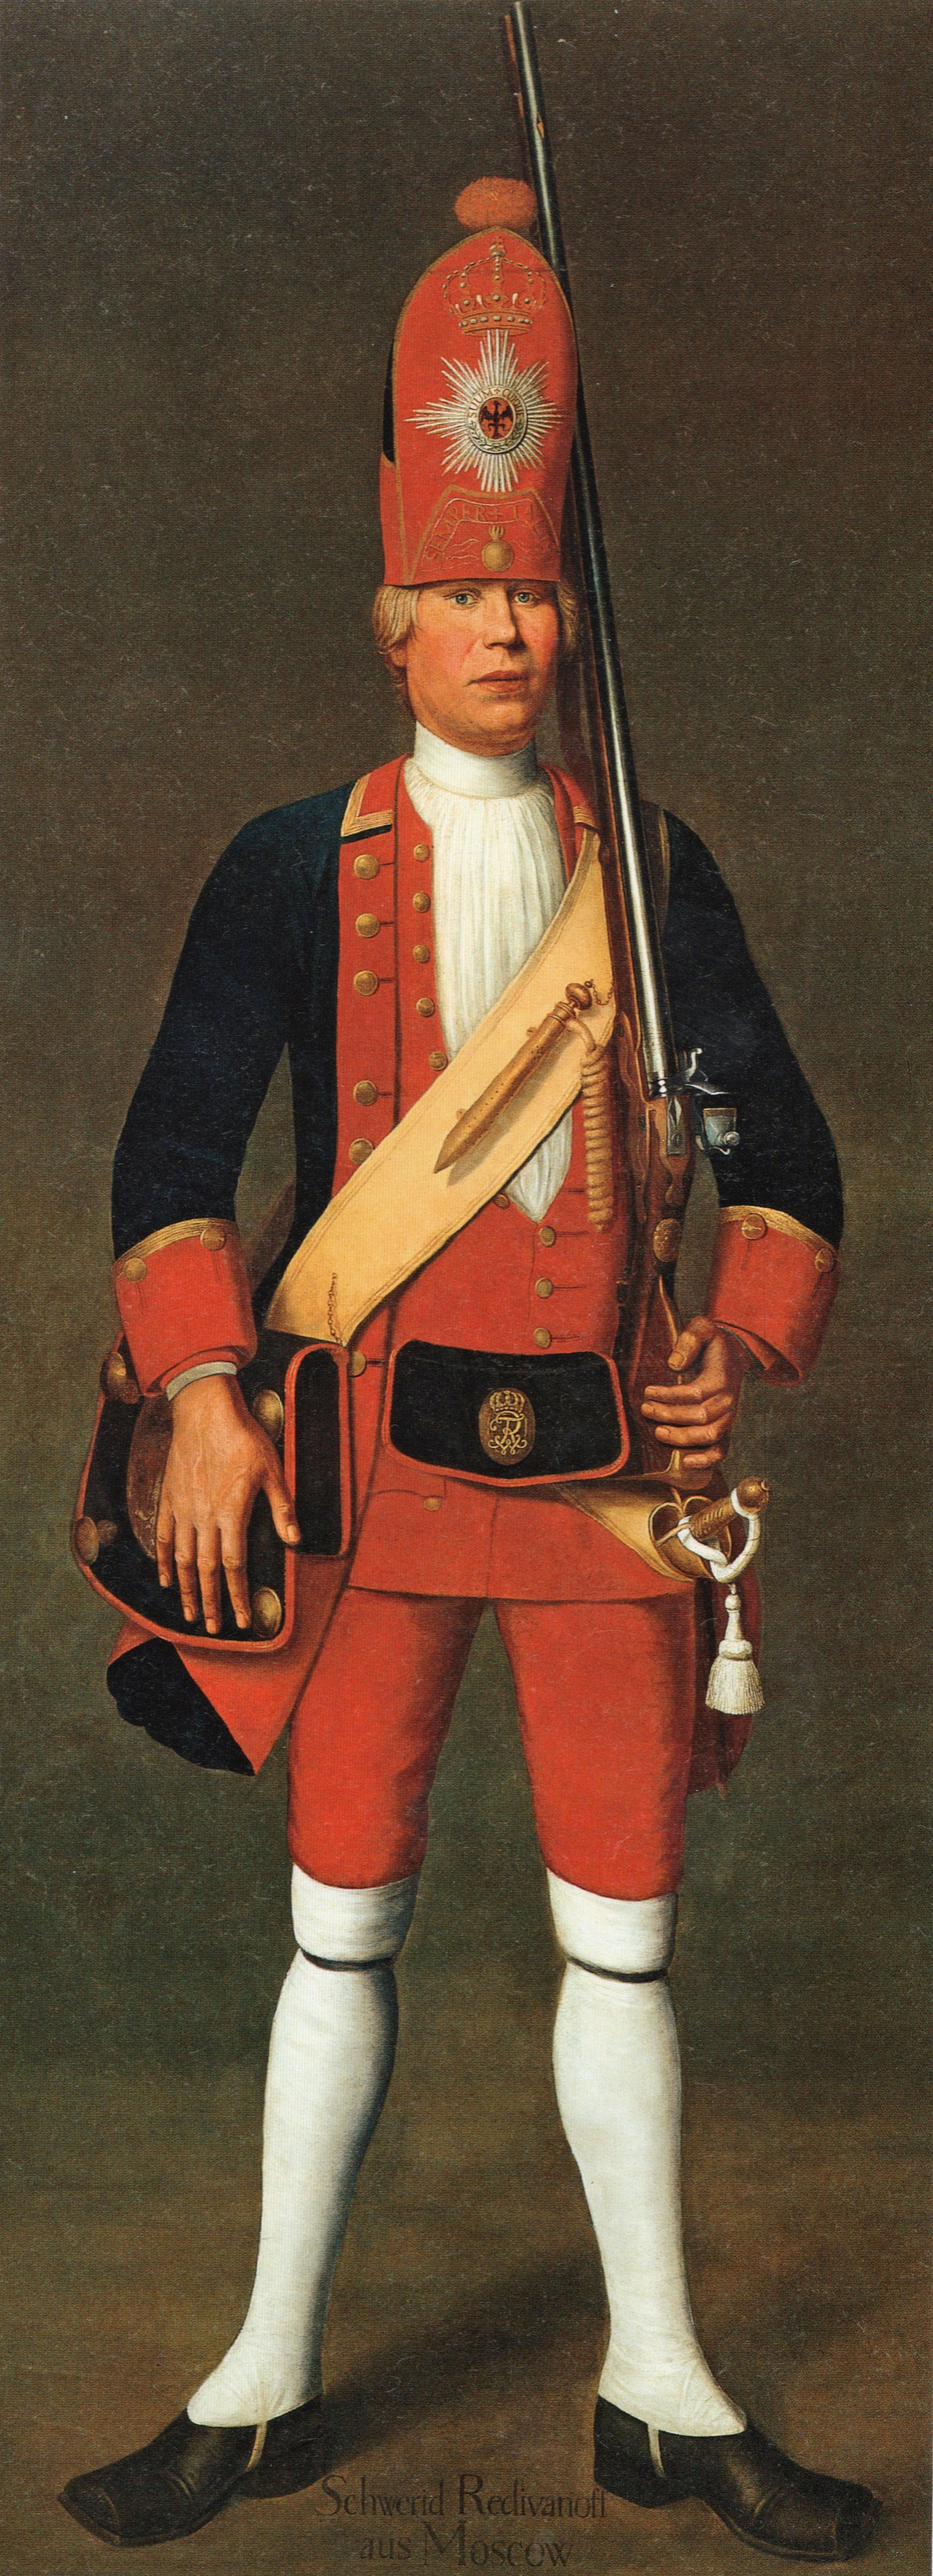 http://upload.wikimedia.org/wikipedia/commons/7/73/Langer_Kerl_Schwerid_Rediwanoff.jpg